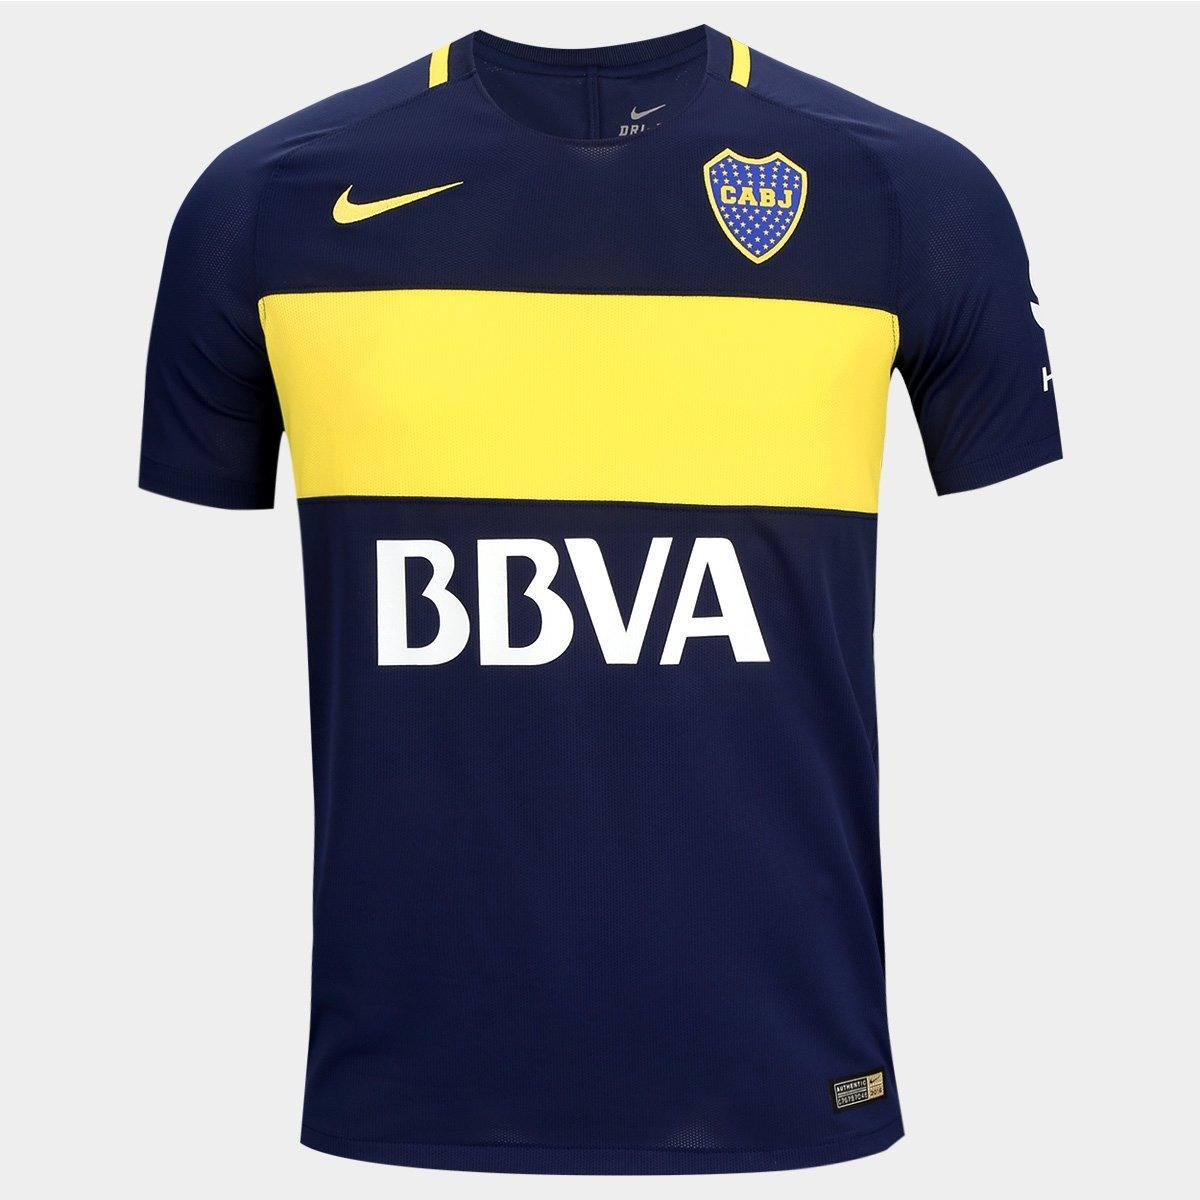 00 Boca Fútbol 2017 En Juniors 800 Match 1 De Nike Camiseta HFqwBR6